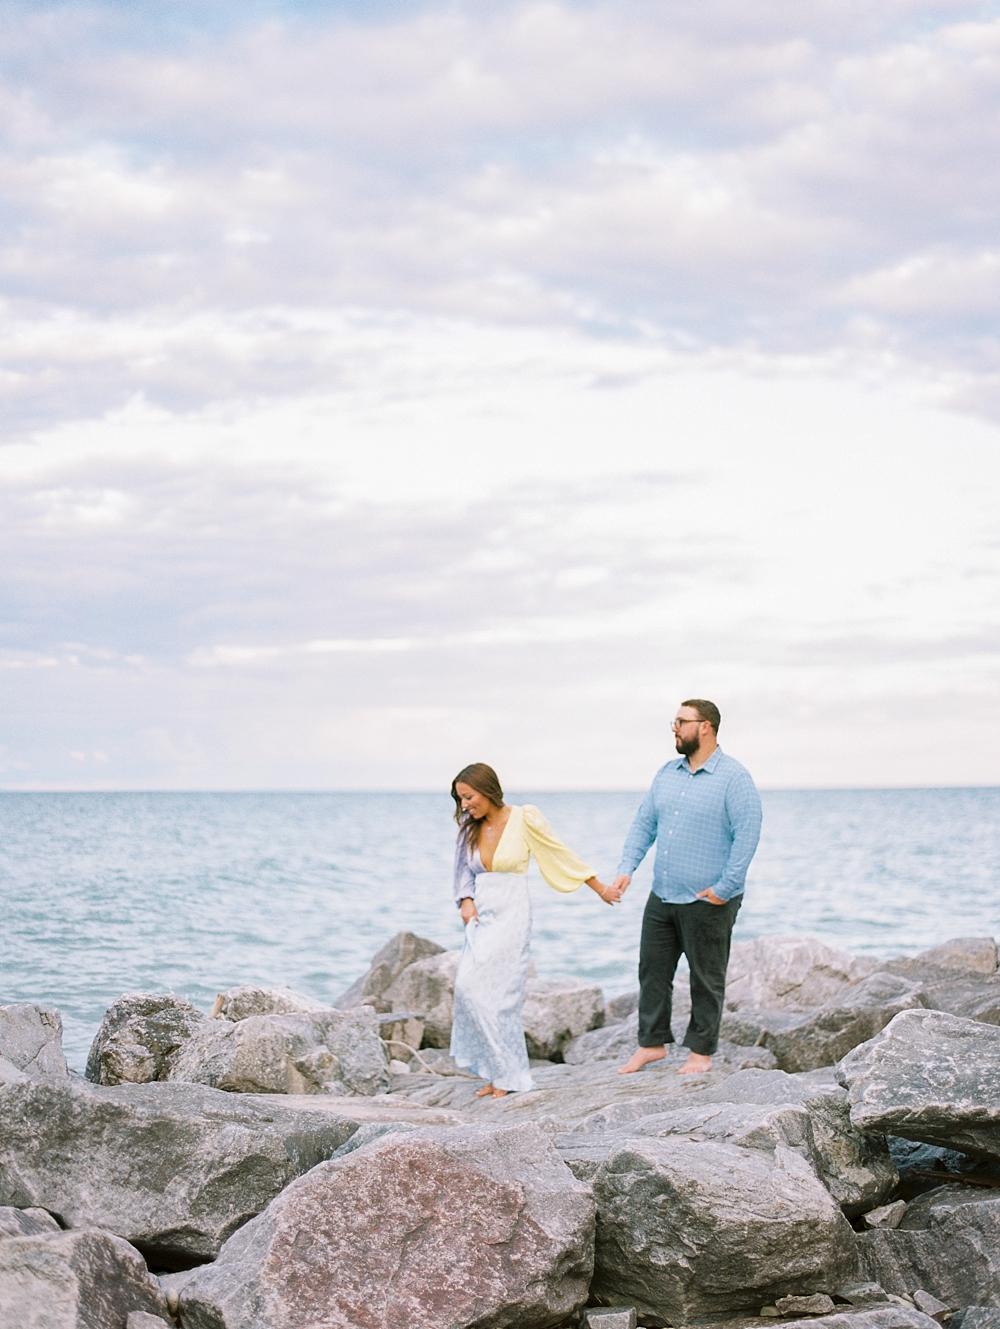 kristin-la-voie-photography-Chicago-Engagement-glencoe-beach-lake-michigan-4